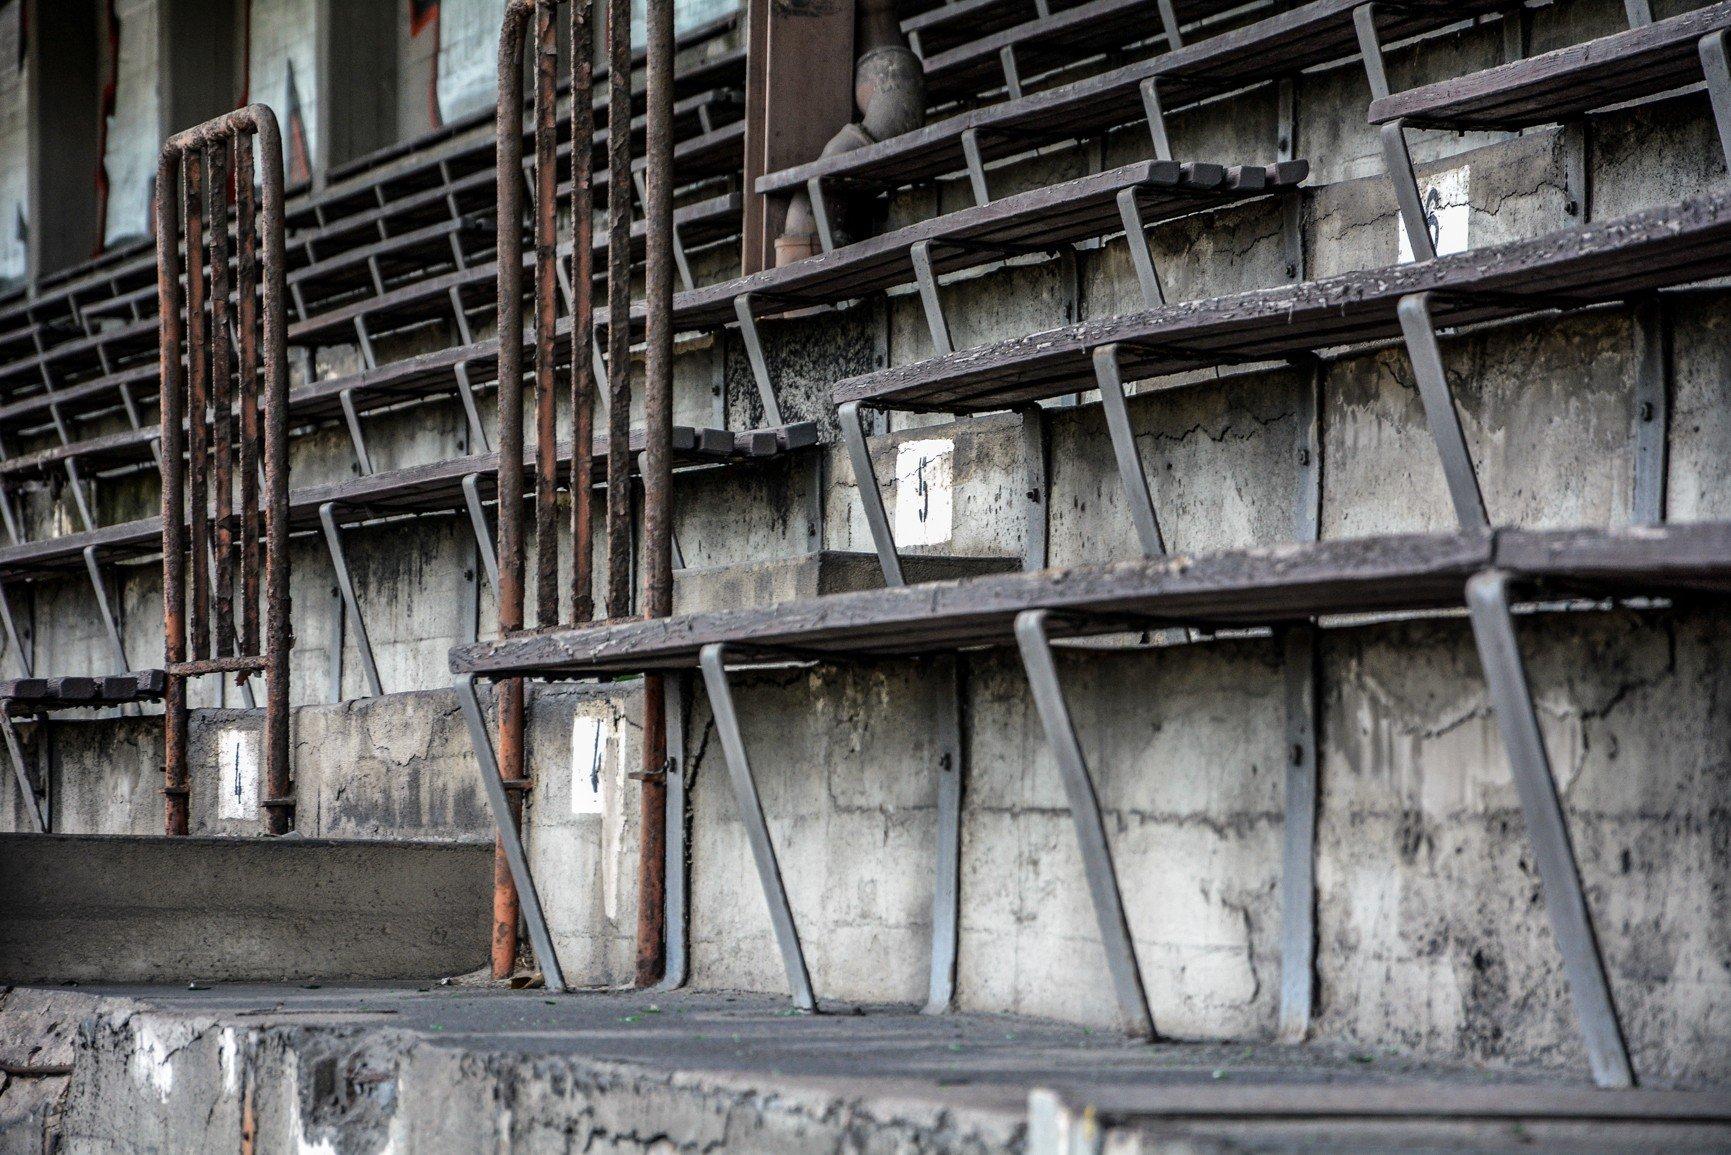 avus tribüne sitzbank lost places abandoned berlin urbex germany